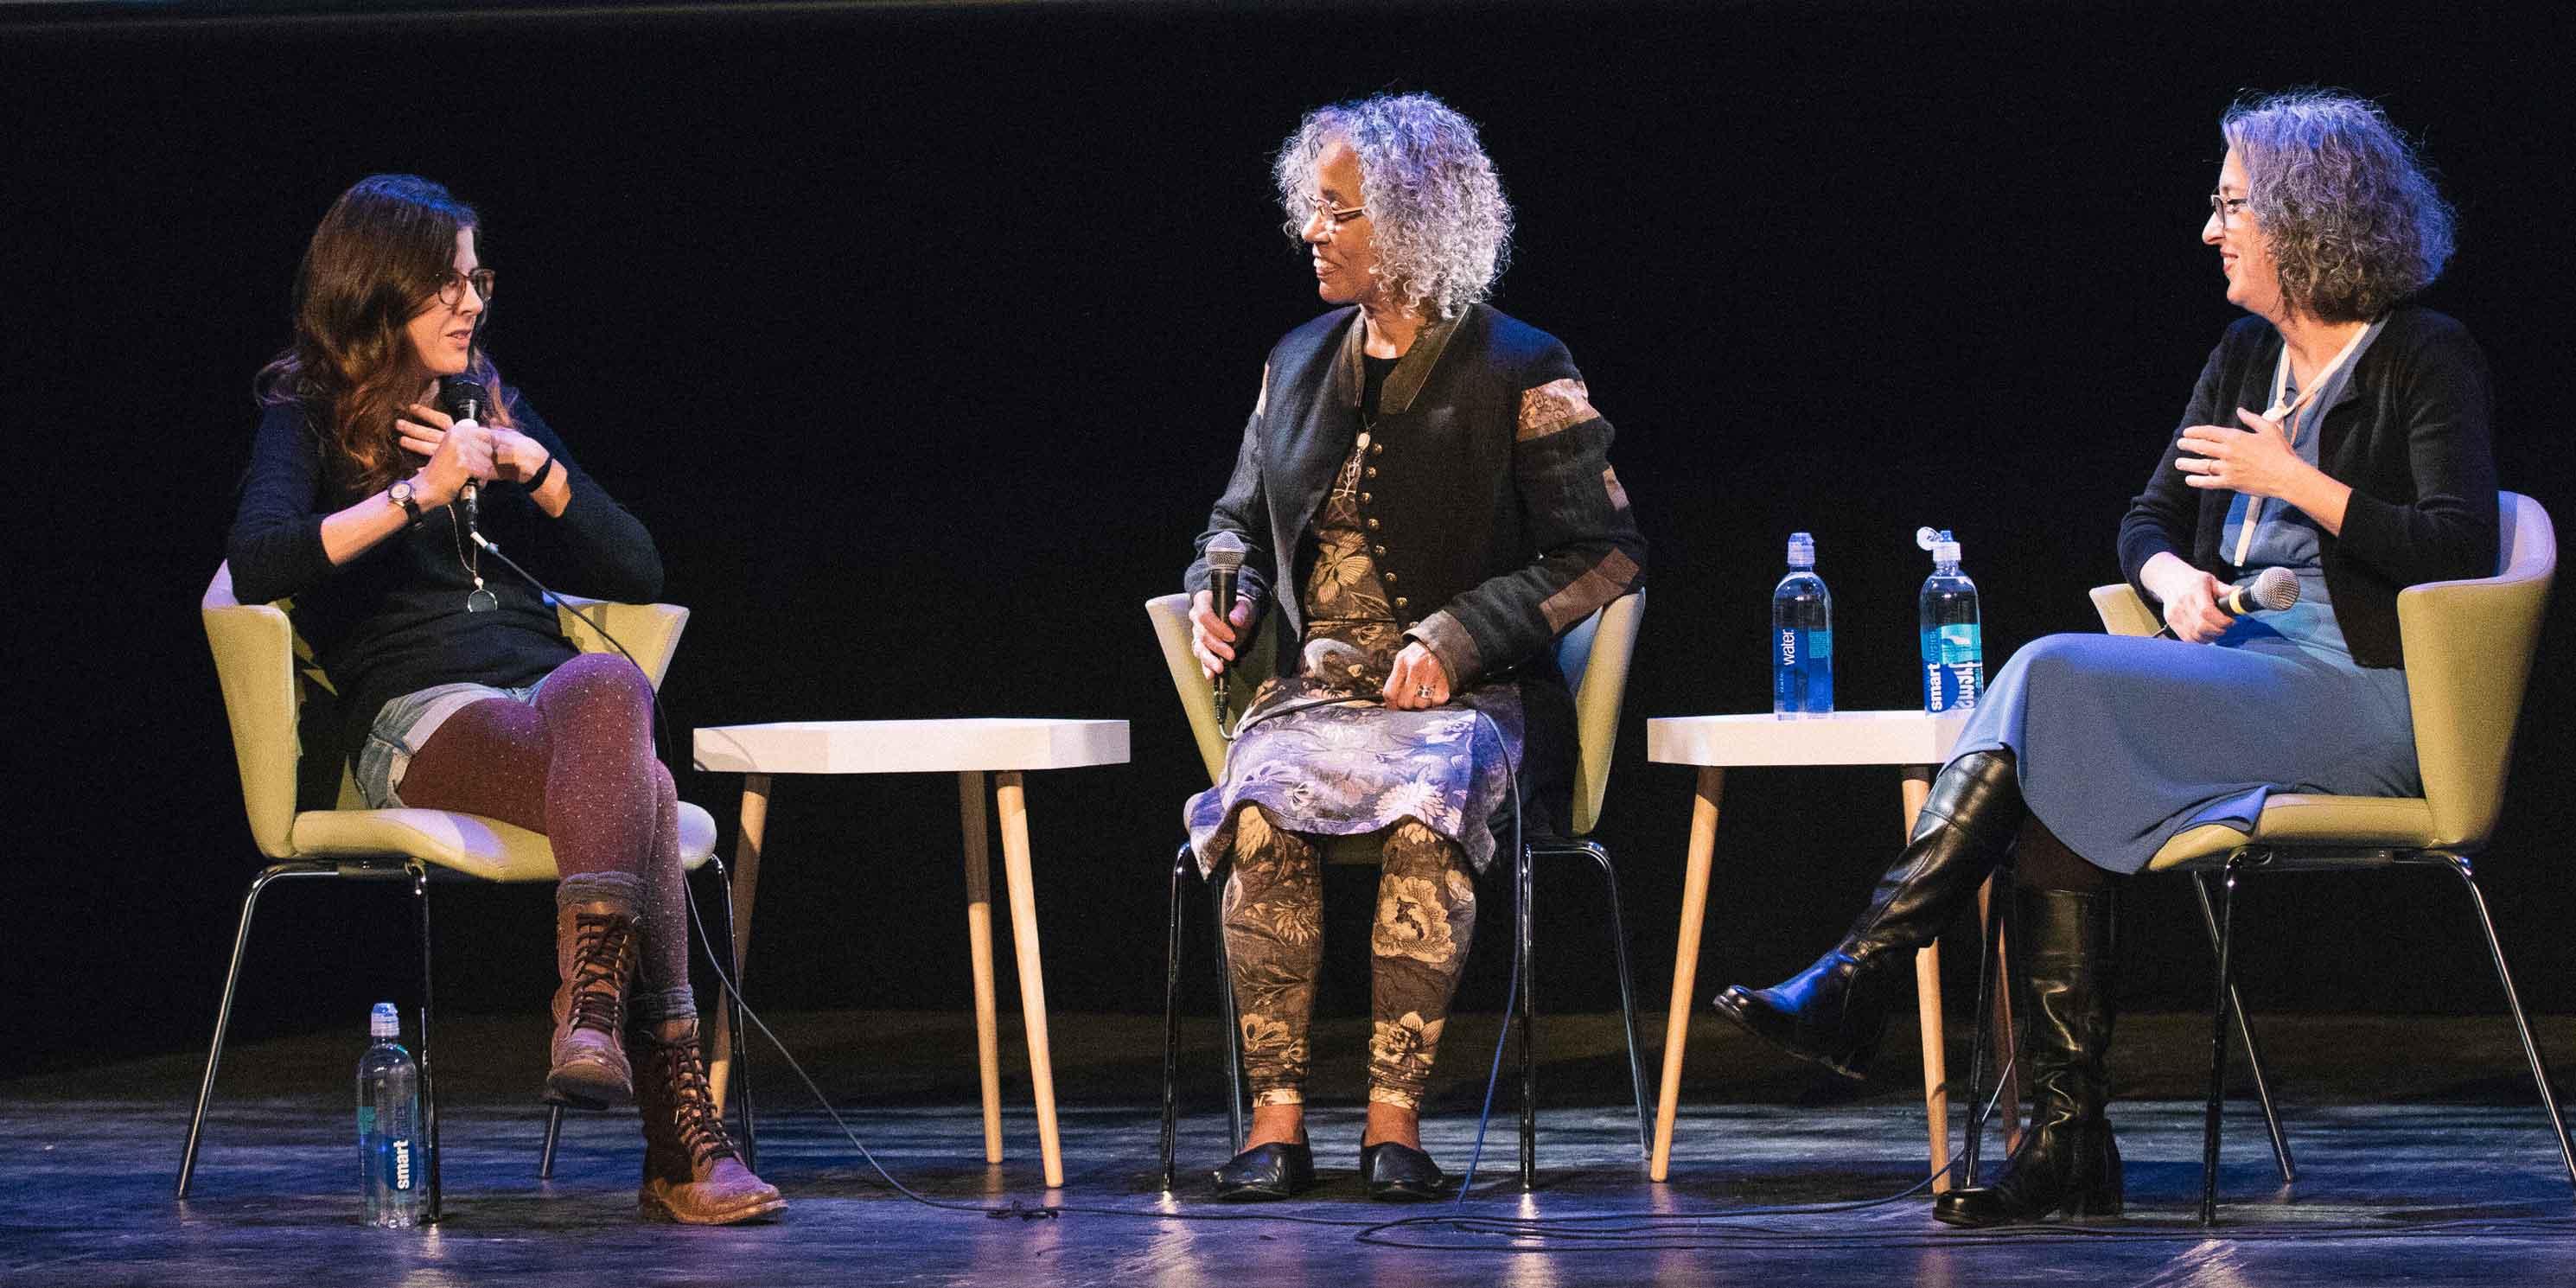 Julia Wertz, Pat Cruz, Melissa Rachleff during the event's panel discussion